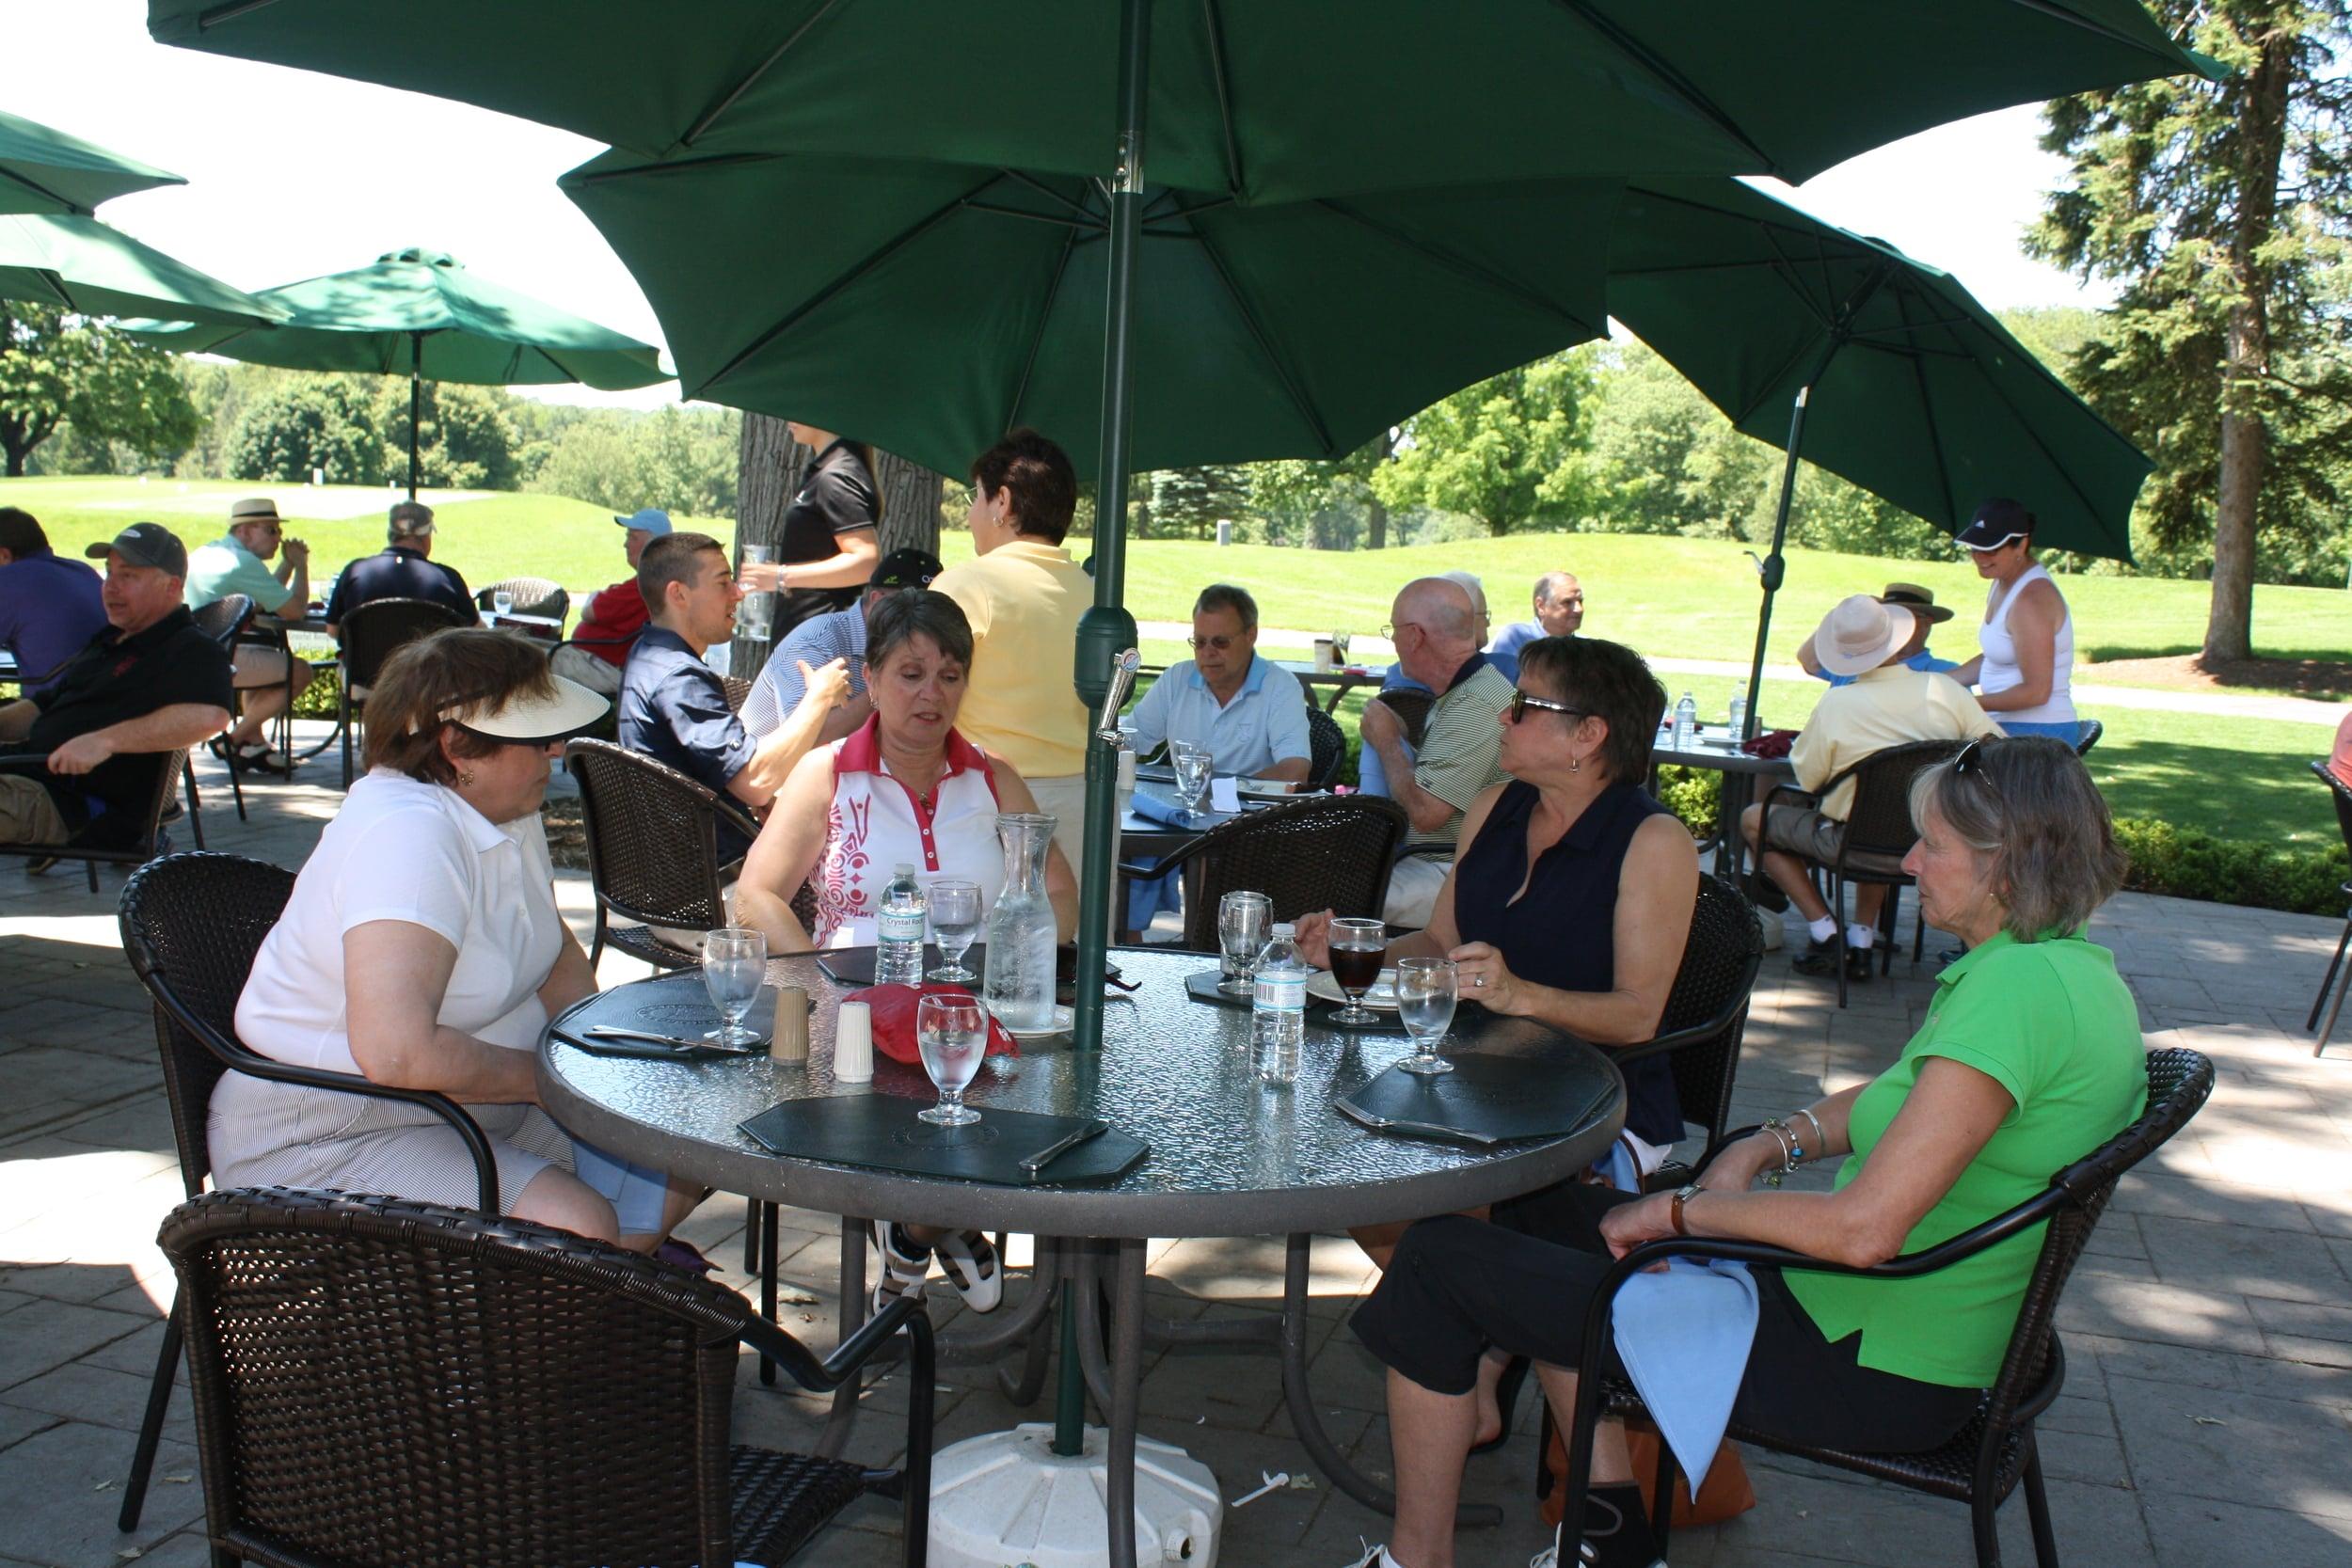 061614 rrcc golf lunch (4).JPG